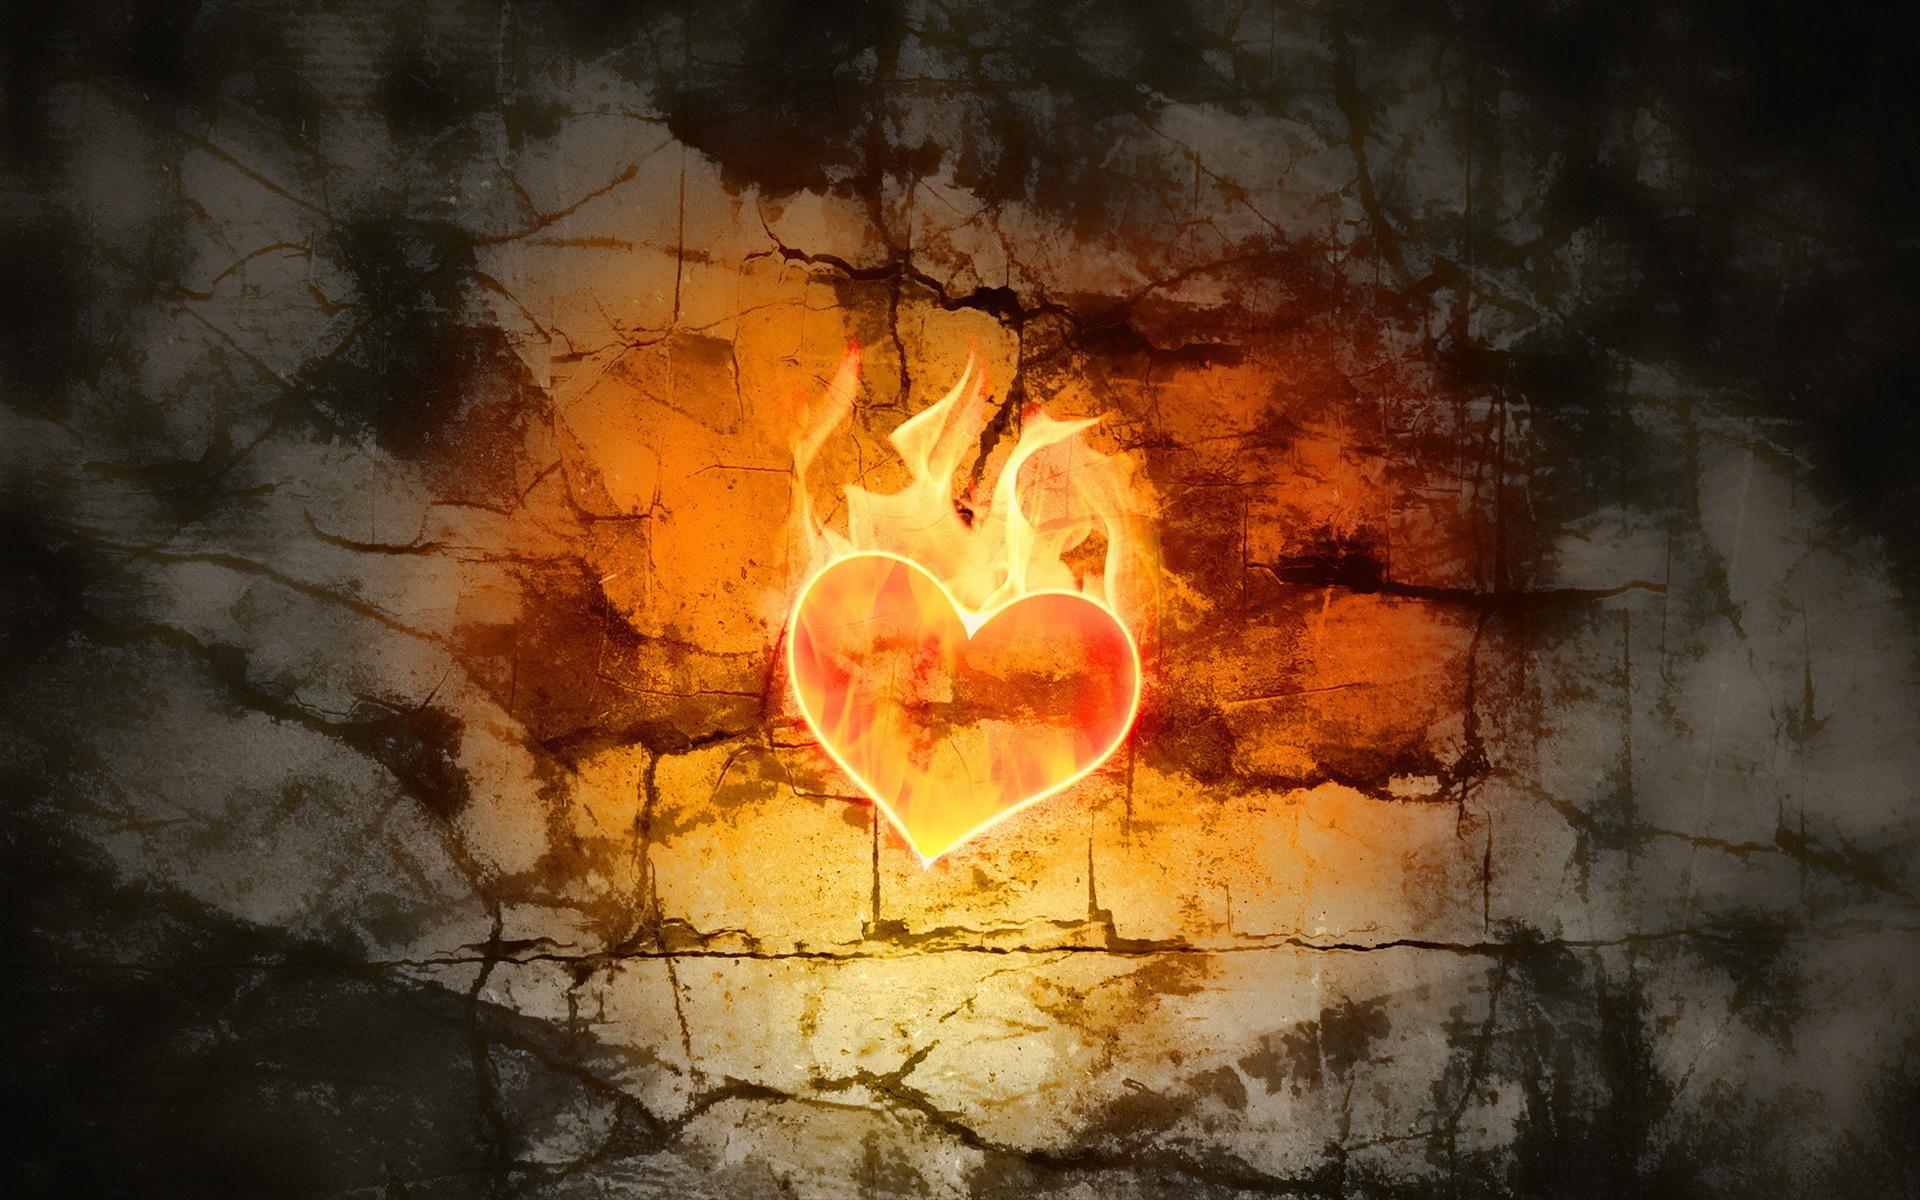 Картинка, сердце горящее картинки